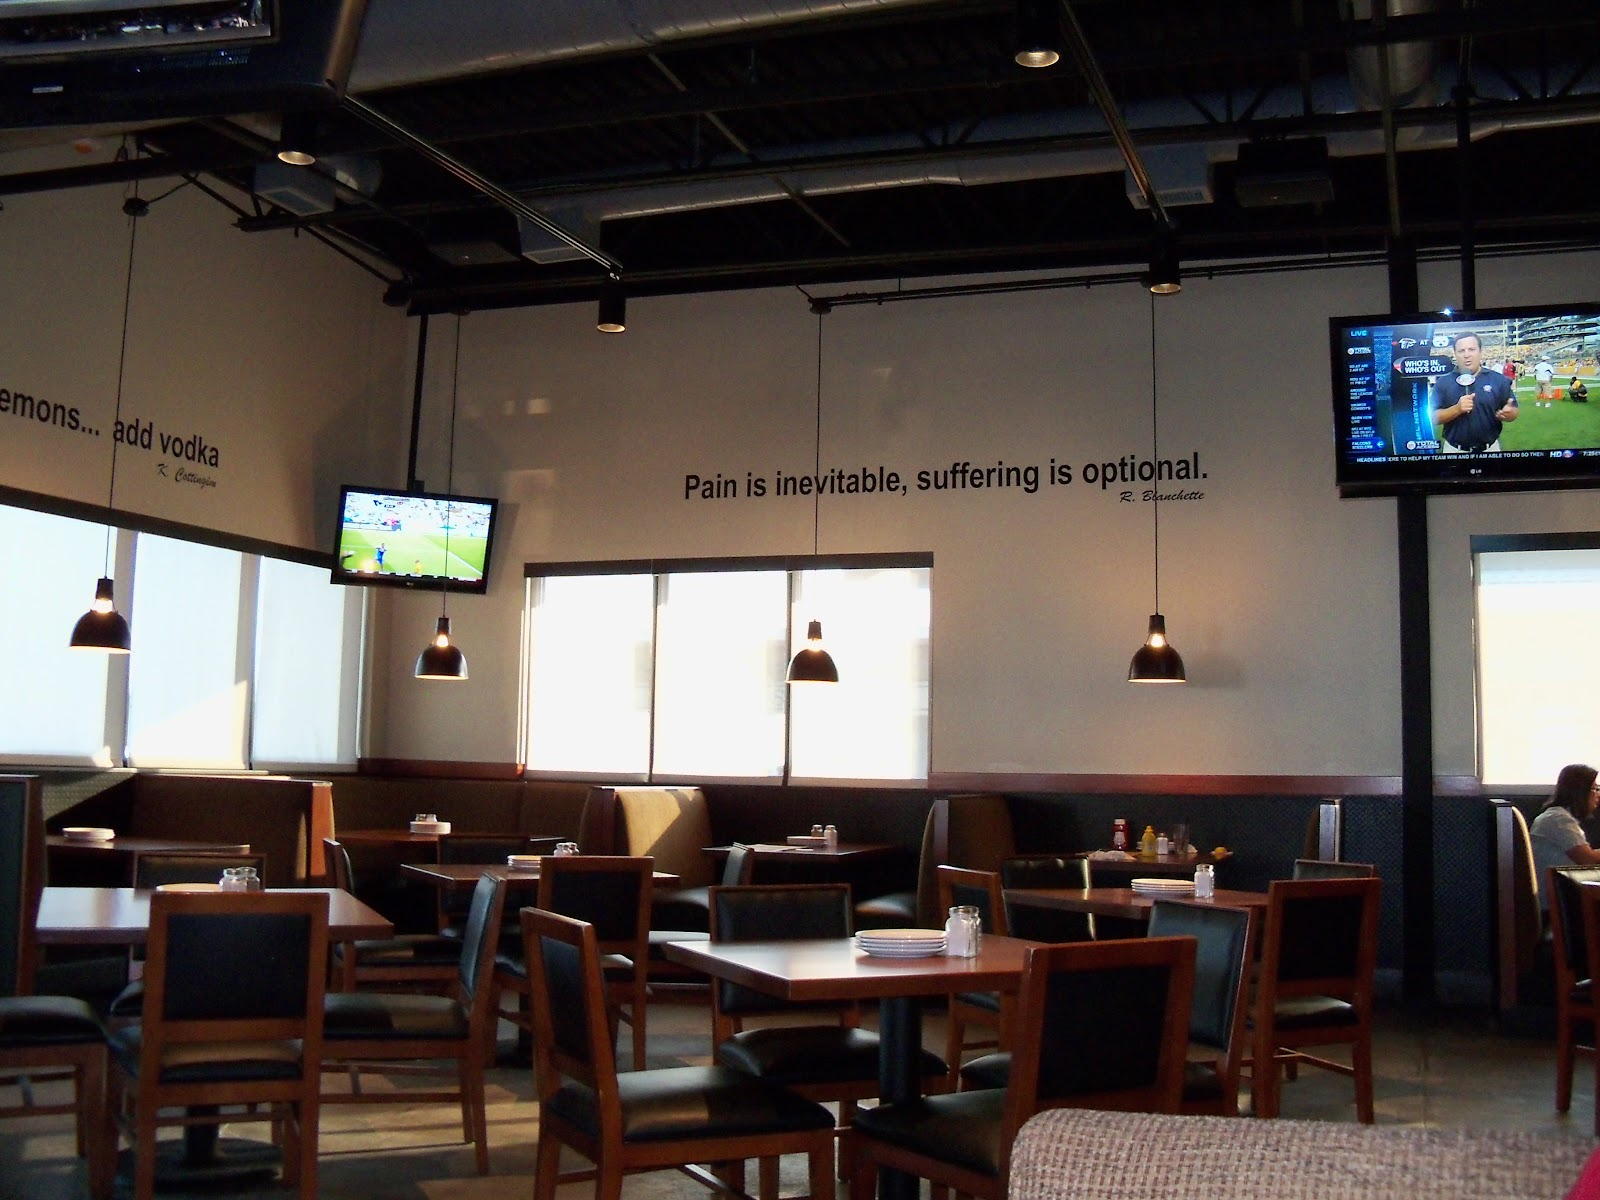 Galveston Vacation 2011 - 115_0216.JPG